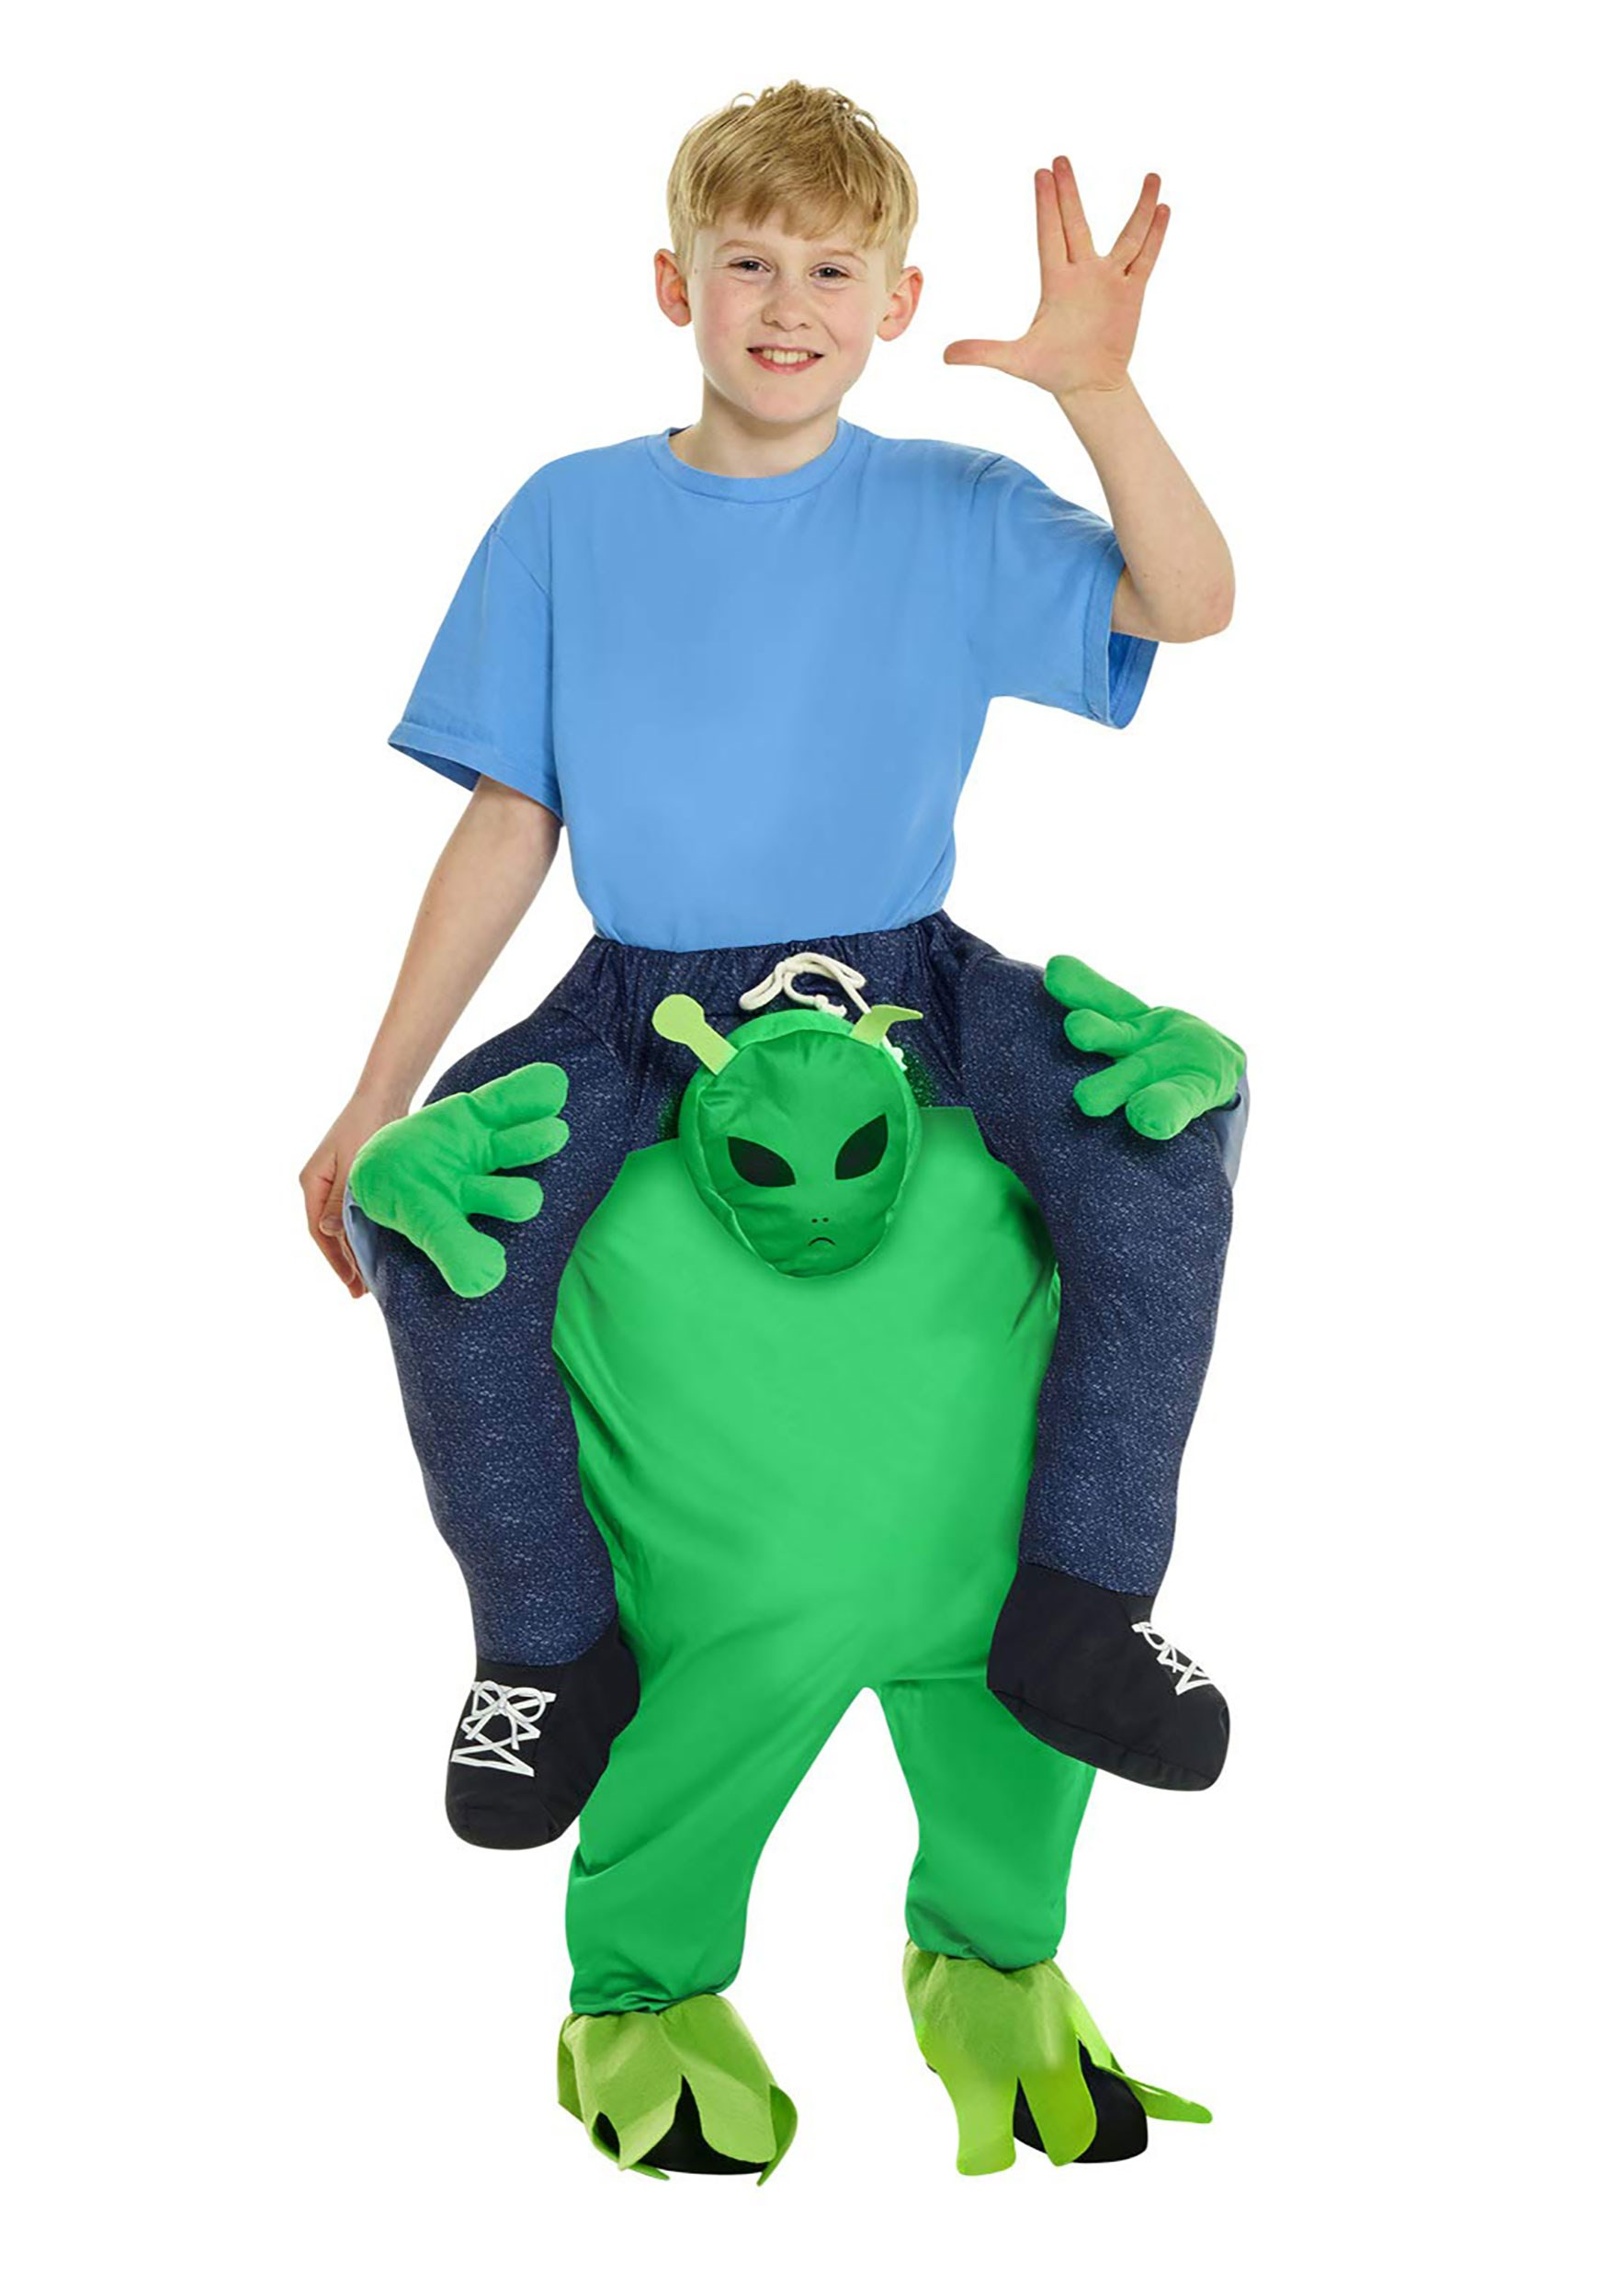 Alien Piggyback Costume for a Child